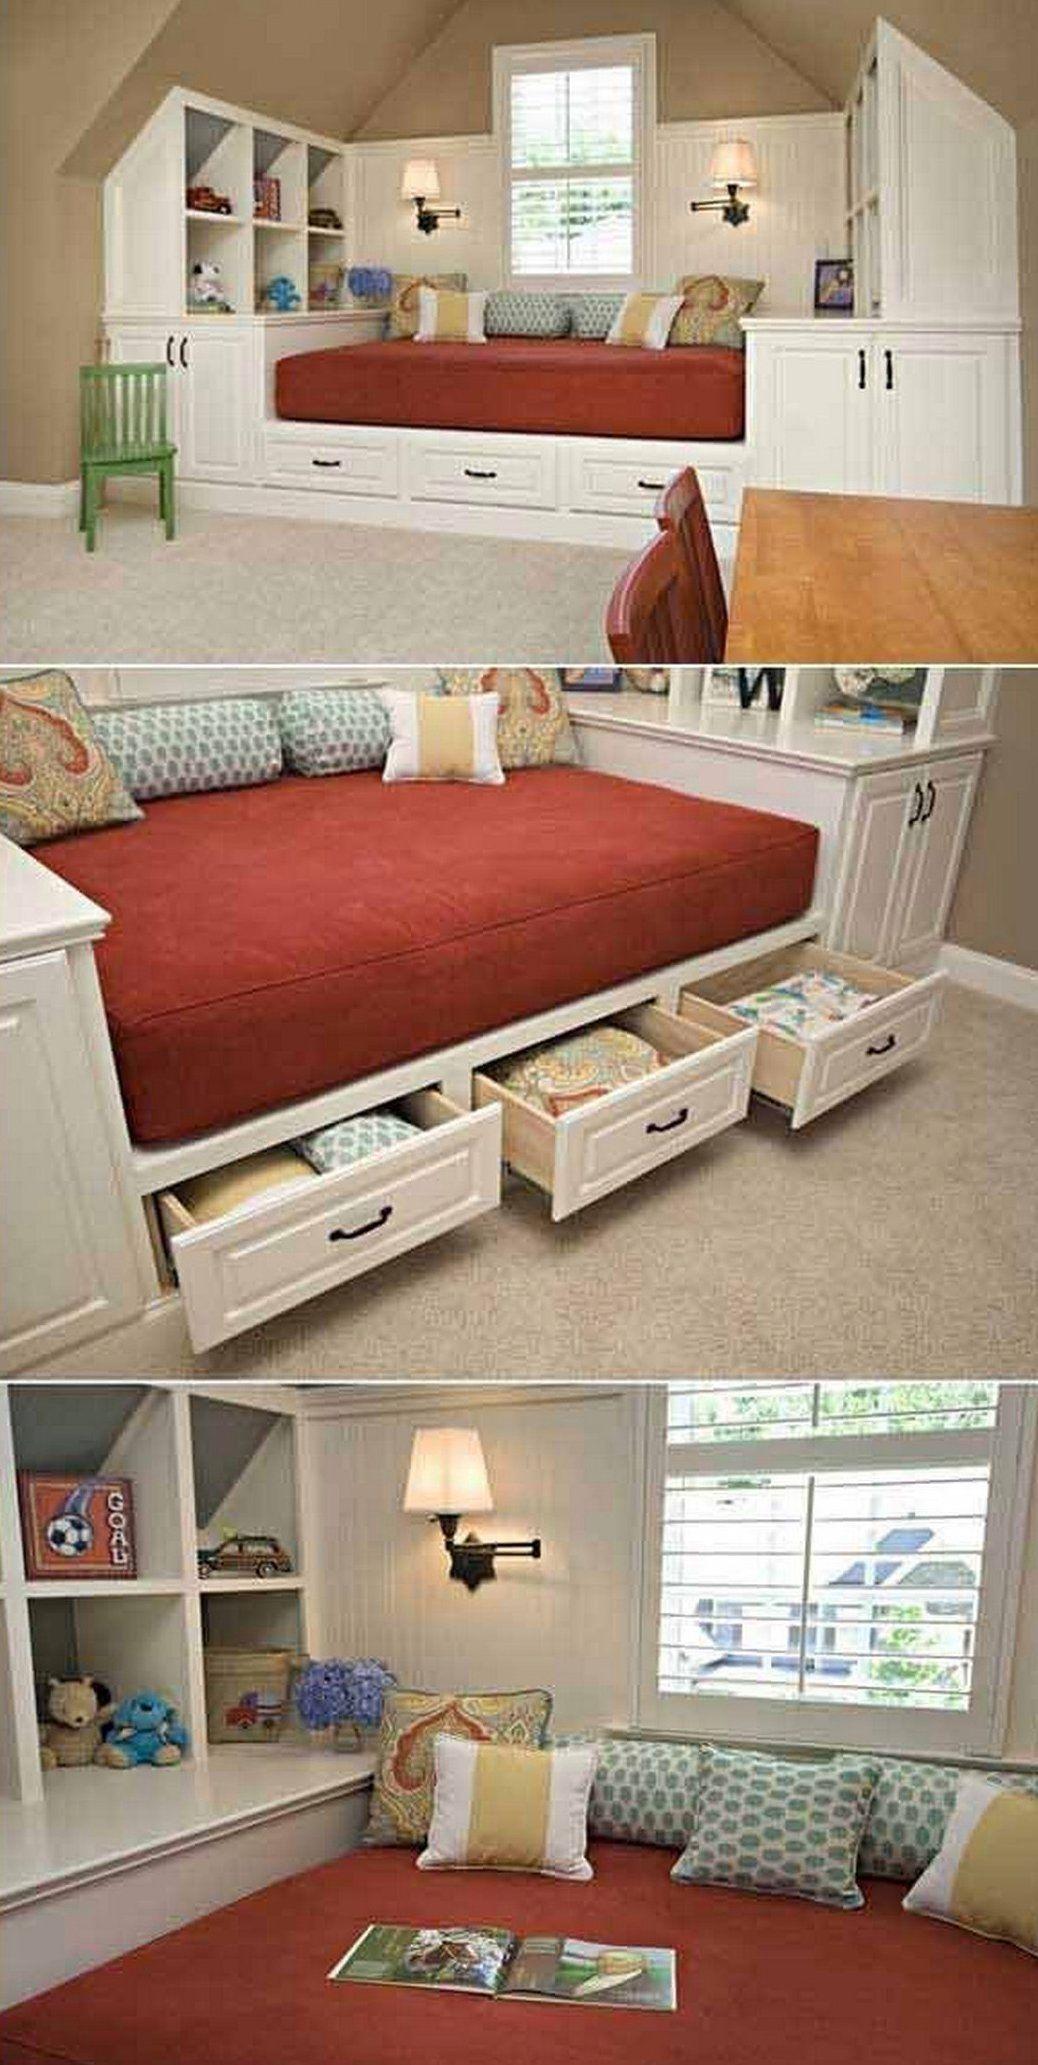 17 Stunning Diy Bedroom Storage Ideas 24988 Bedroom Storage Bedroomstorage The Bedroom Is One O In 2020 Small Room Diy Small Space Storage Bedroom Bedroom Storage